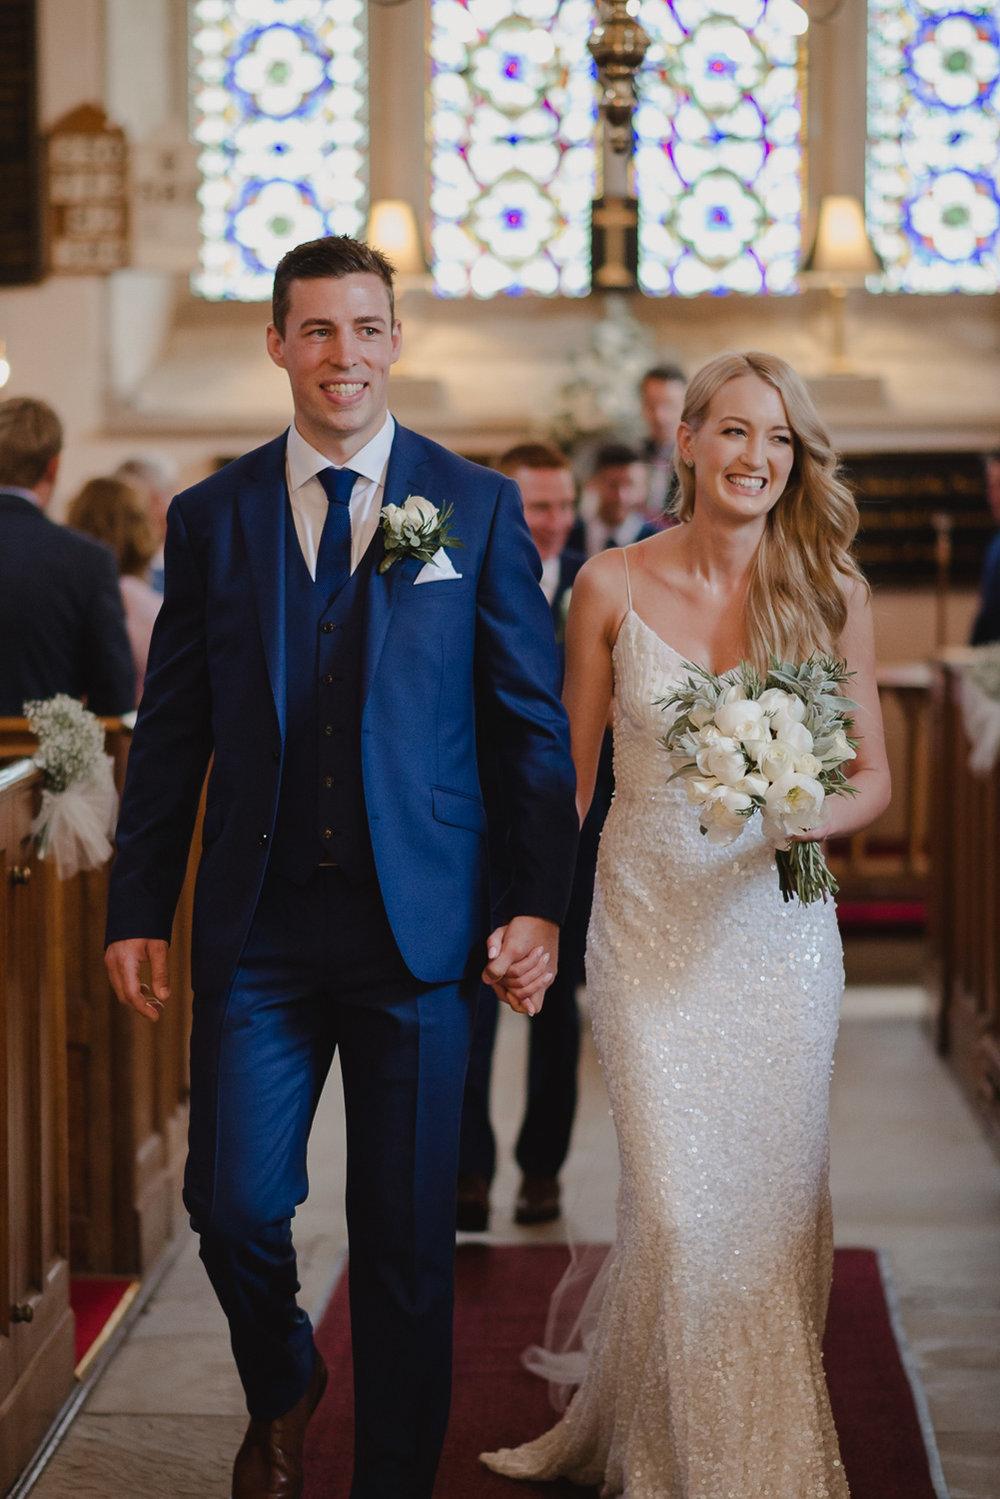 Tullyveery House wedding photography -28.jpg